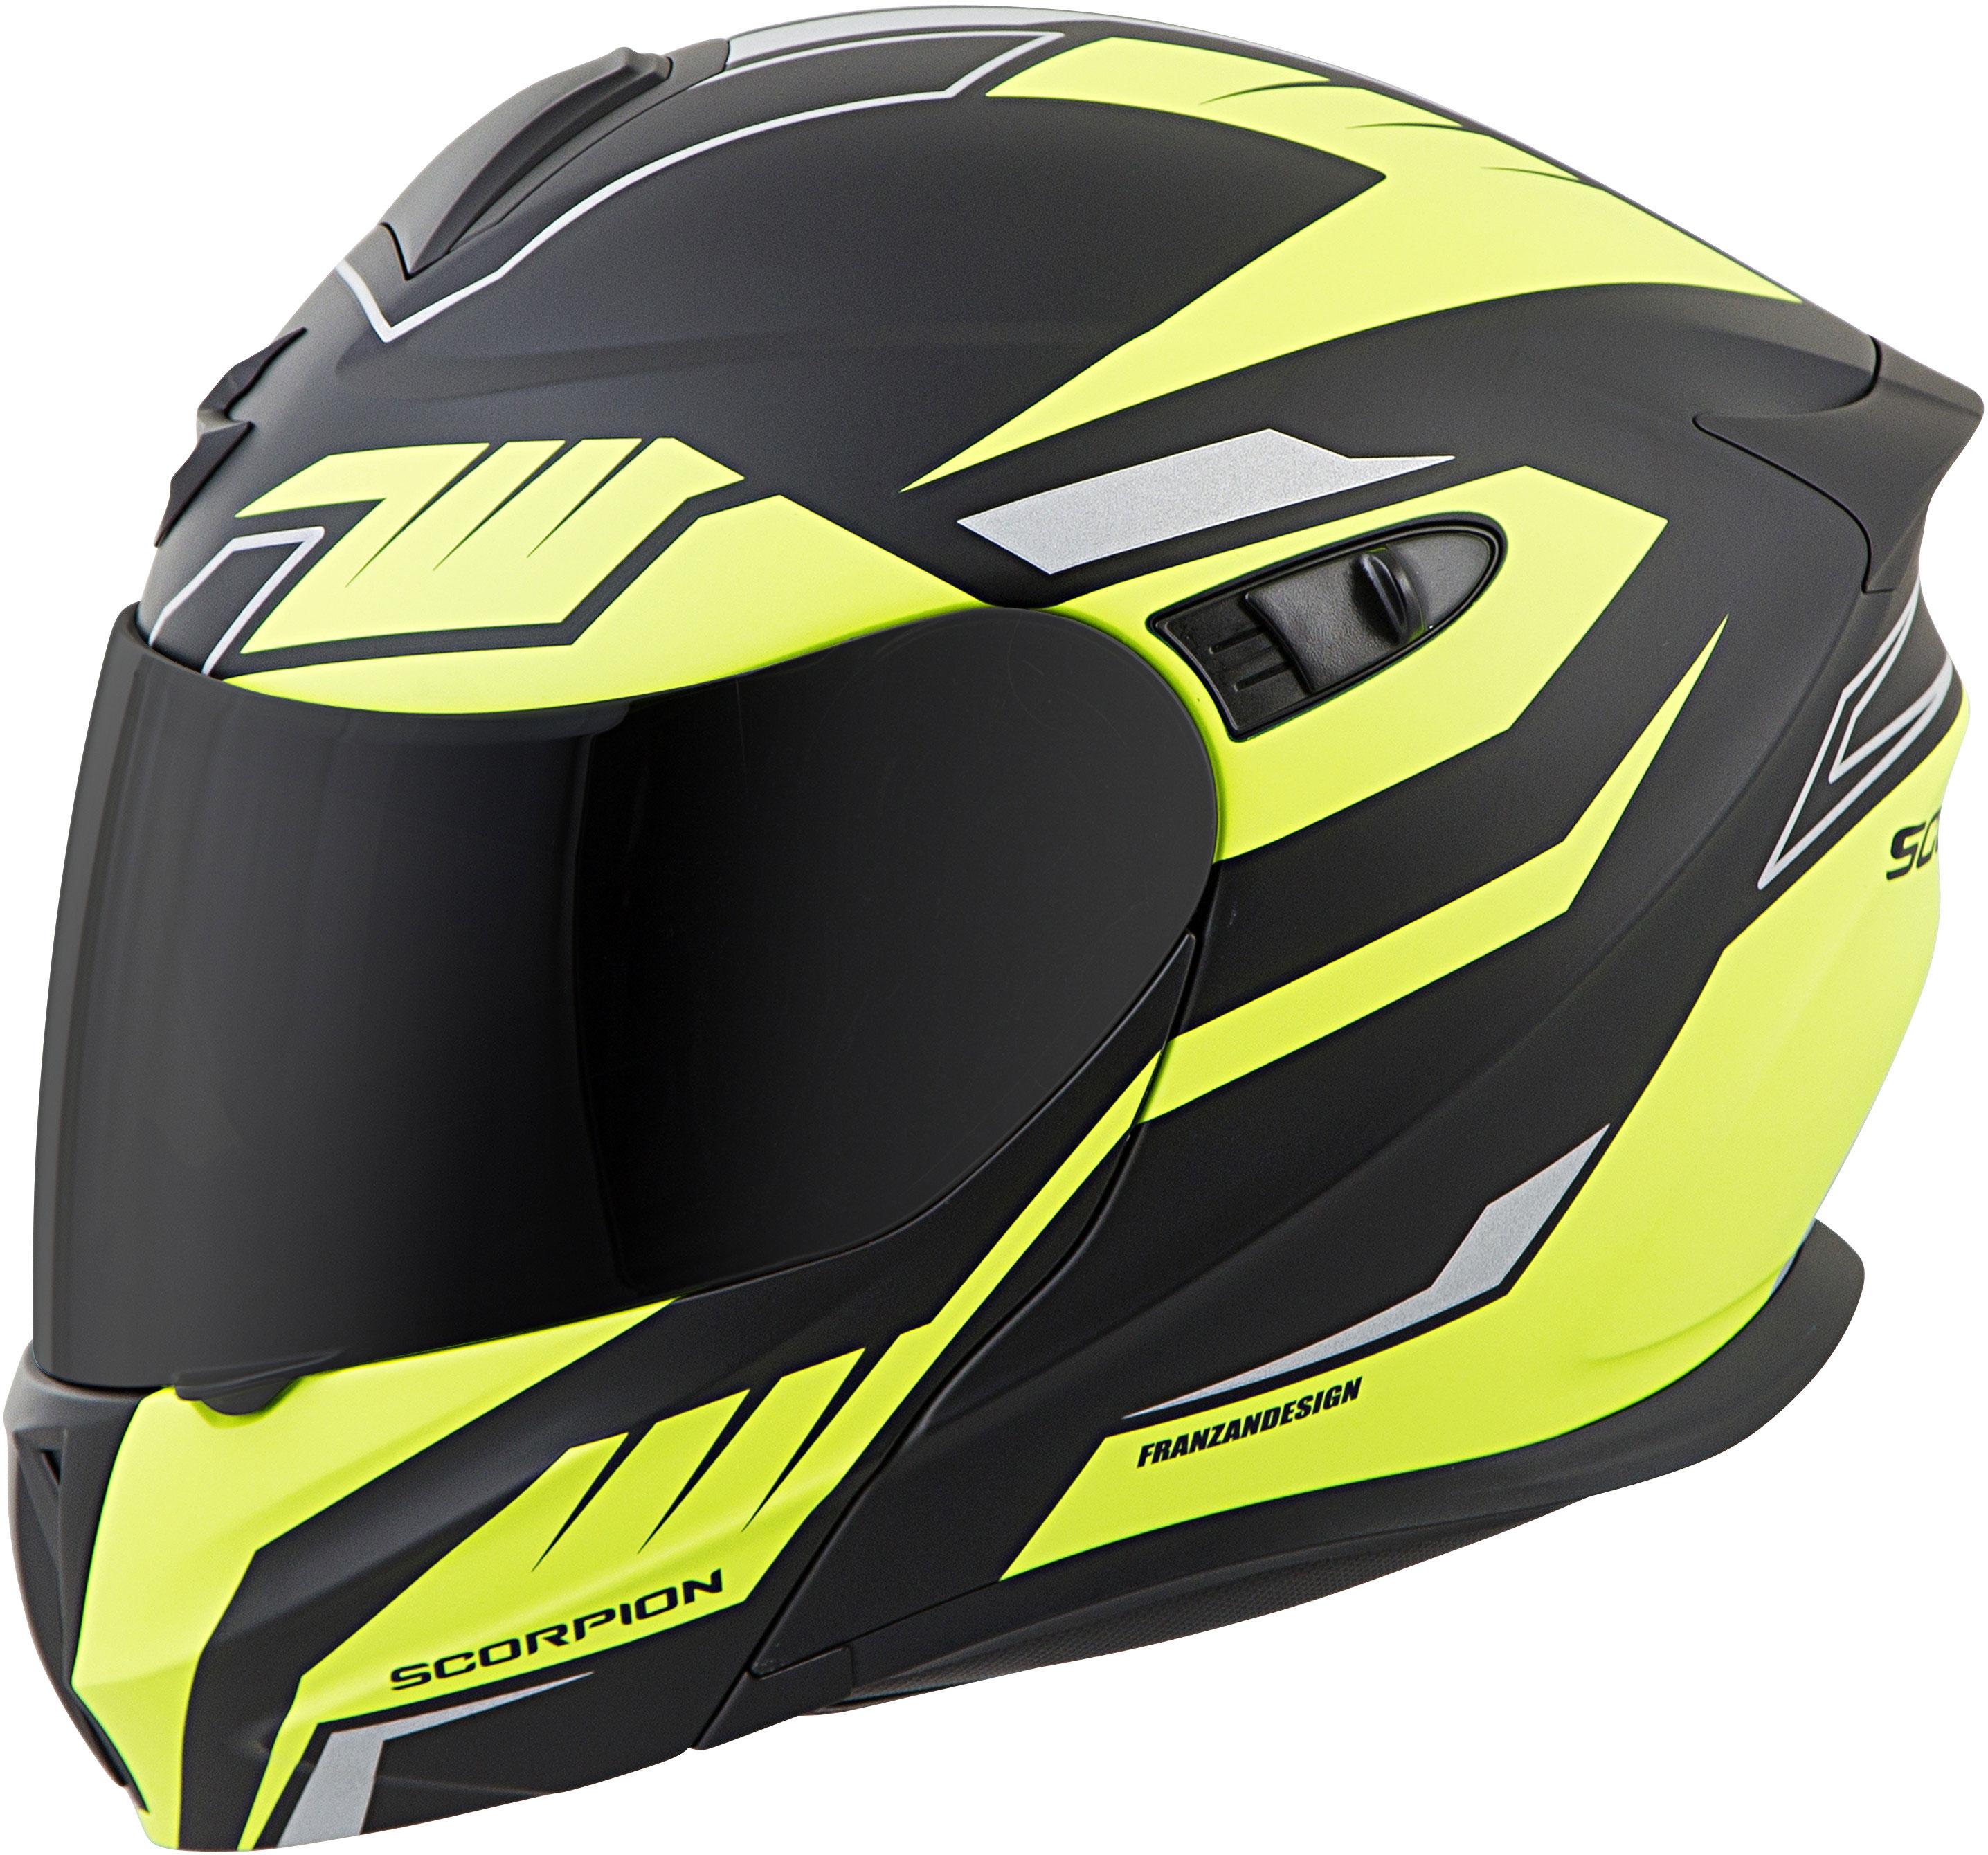 Scorpion EXO-GT920 Modular Shuttle Helmet